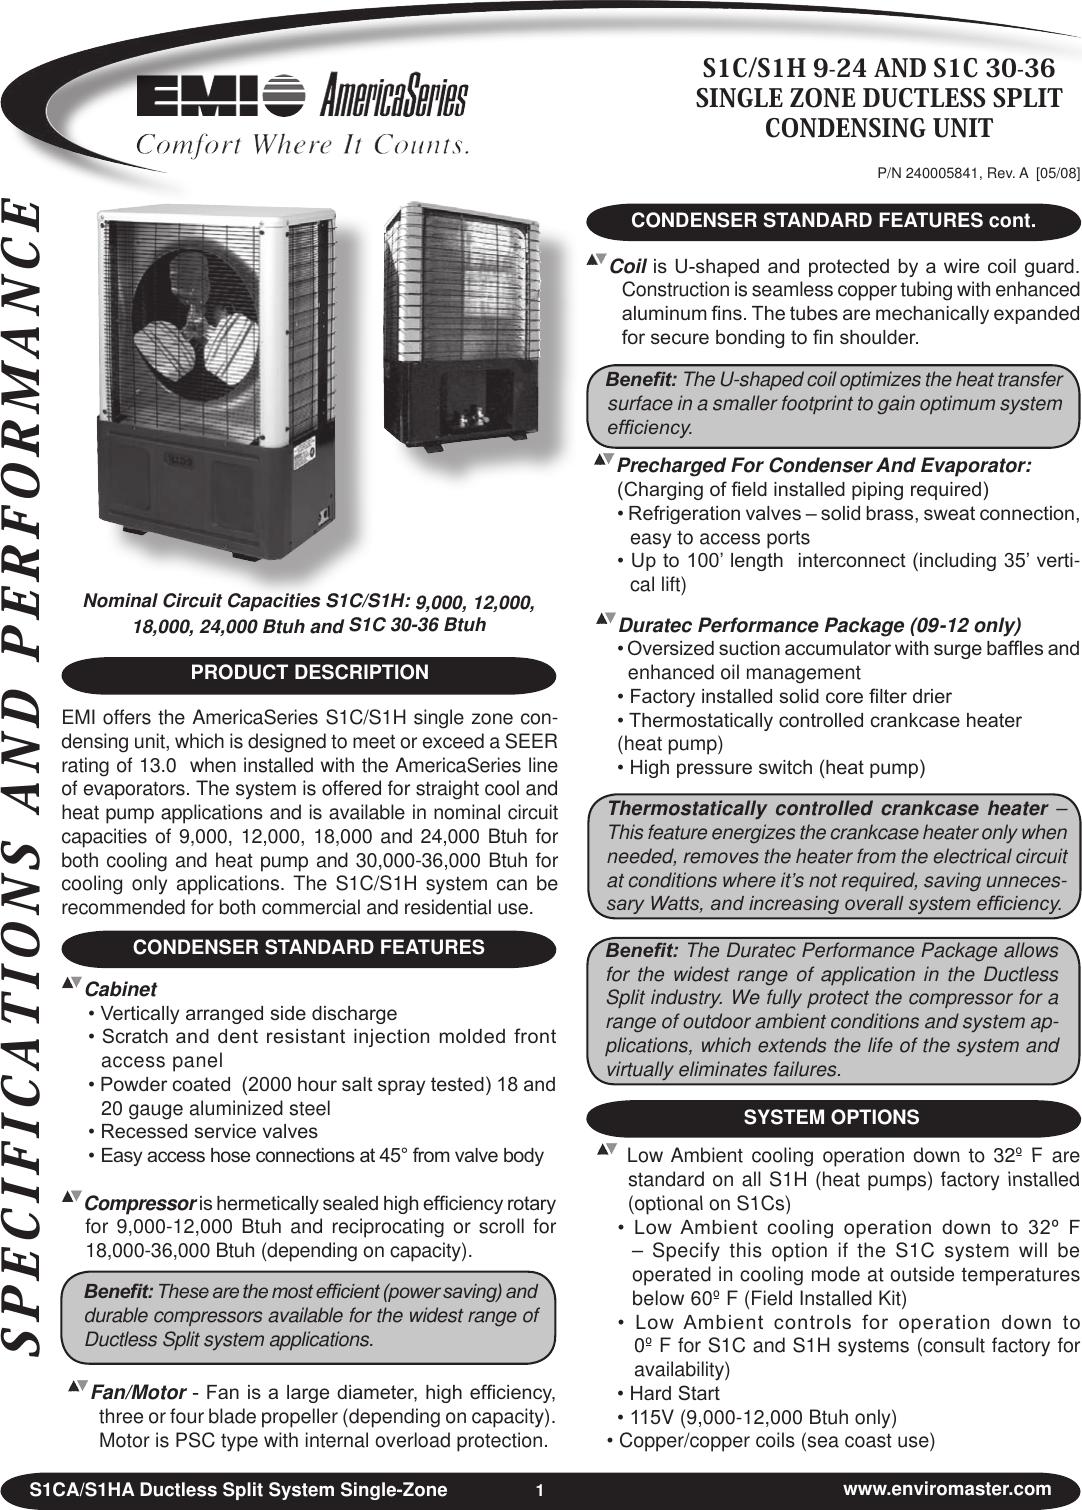 Excellent Emi Mini Split Wiring Diagram Images - Electrical System ...